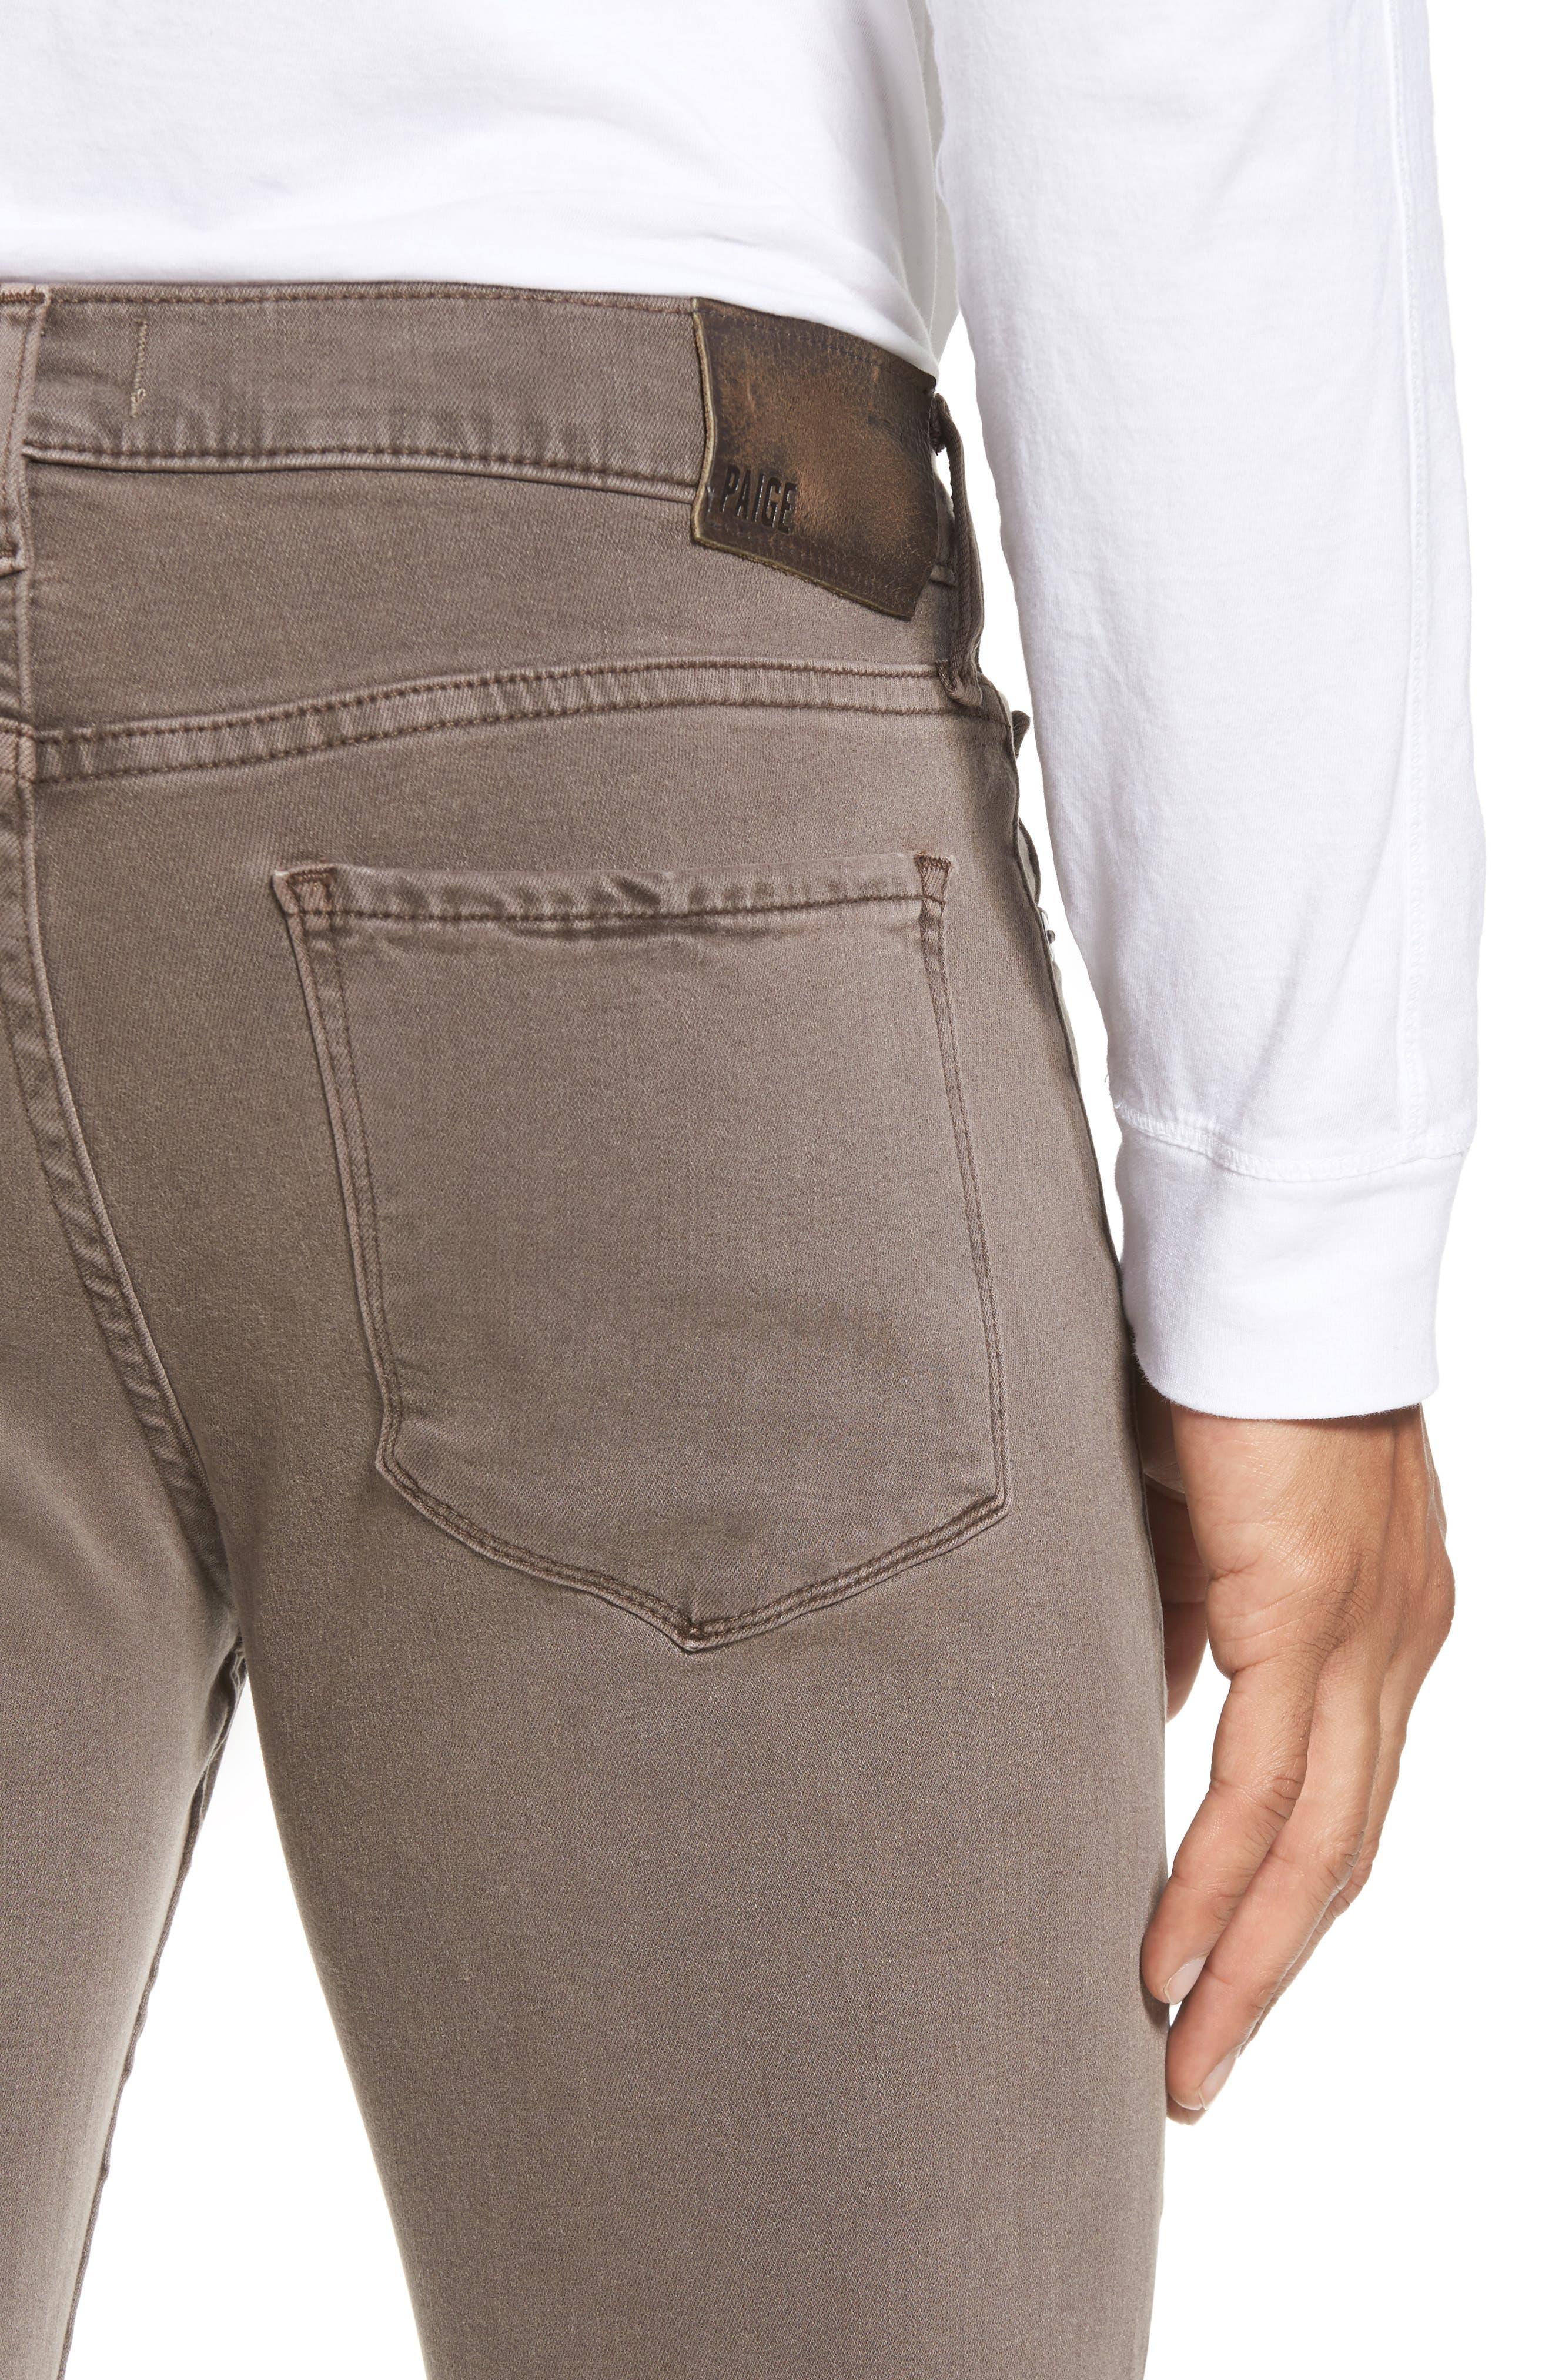 Transcend - Lennox Slim Fit Jeans,                             Alternate thumbnail 4, color,                             VINTAGE SAND BAR